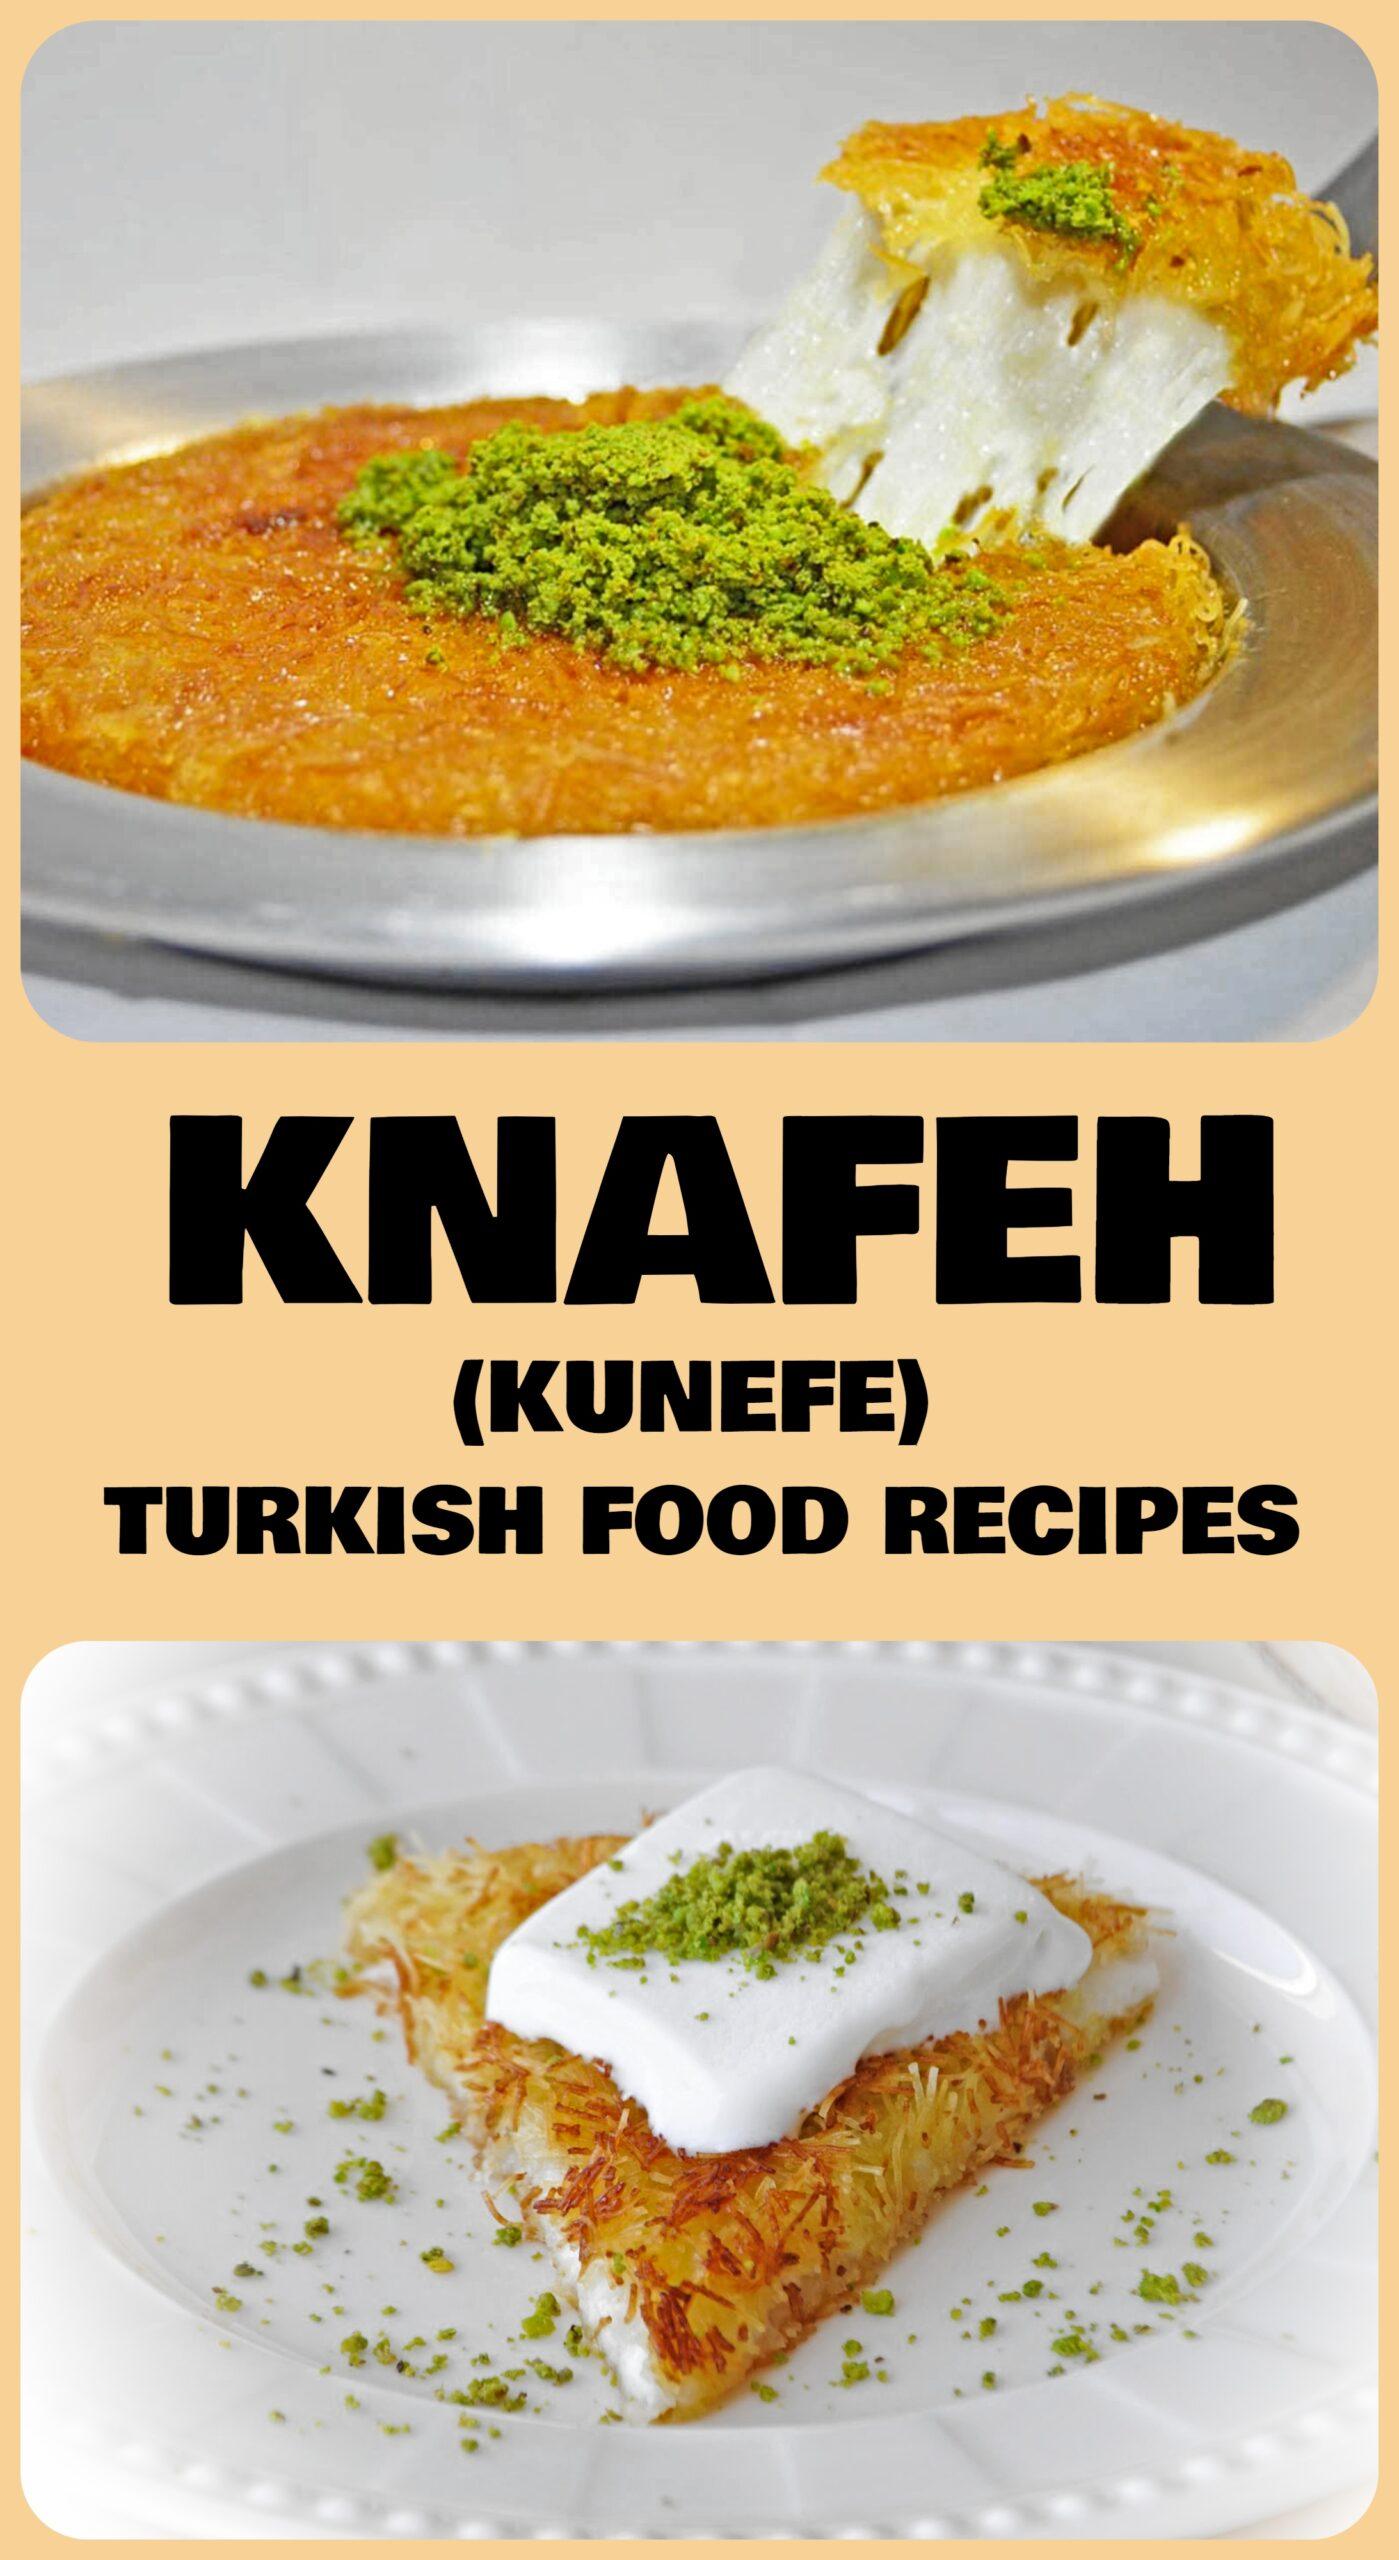 Knafeh - Kunefe Recipe